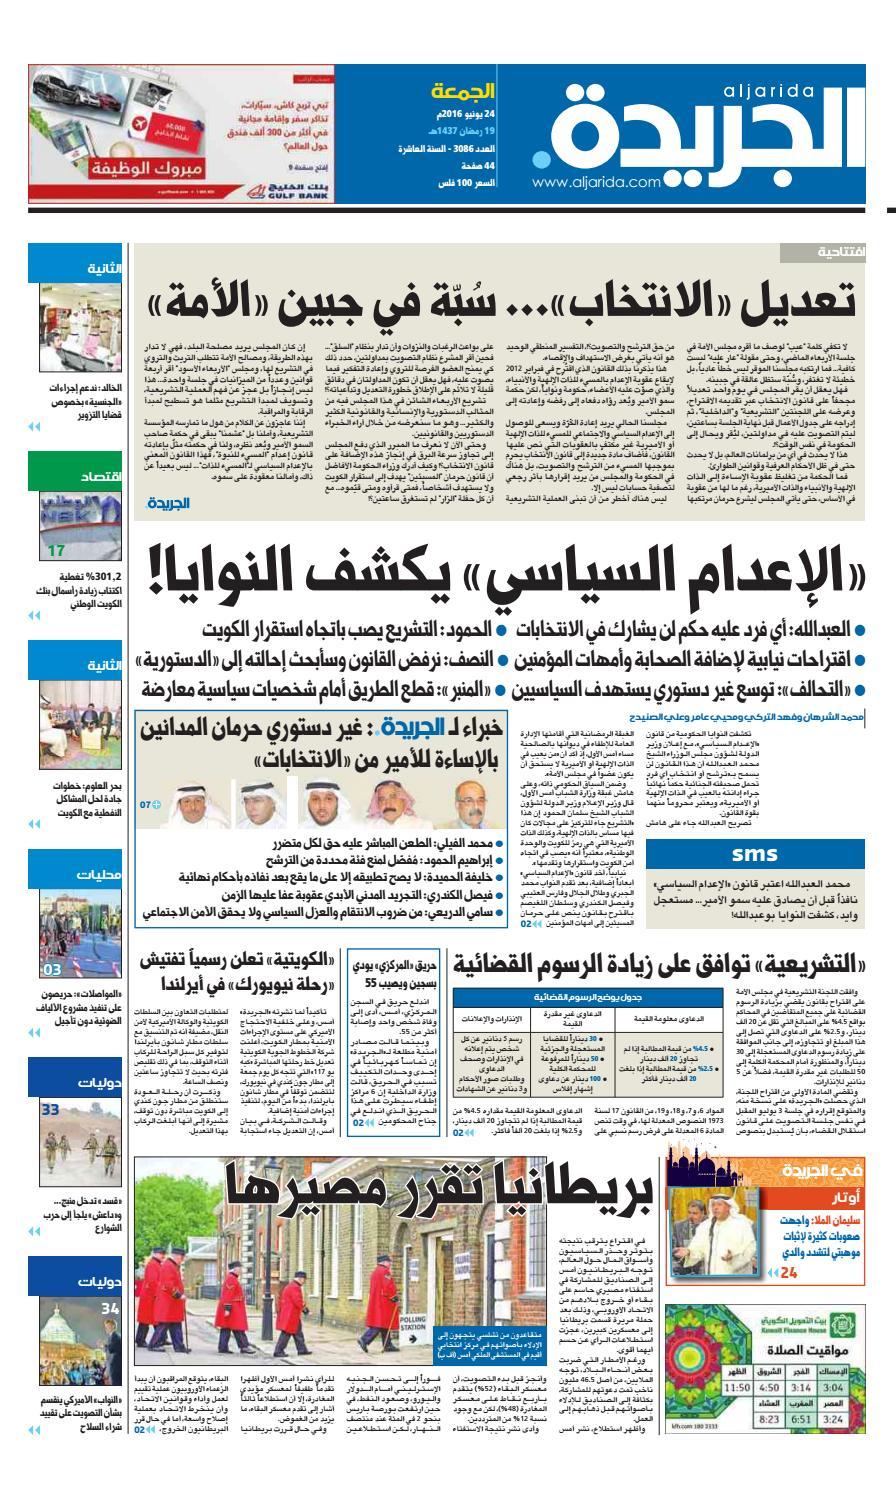 b1b889da2 عدد الجريدة 24 يونيو 2016 by Aljarida Newspaper - issuu